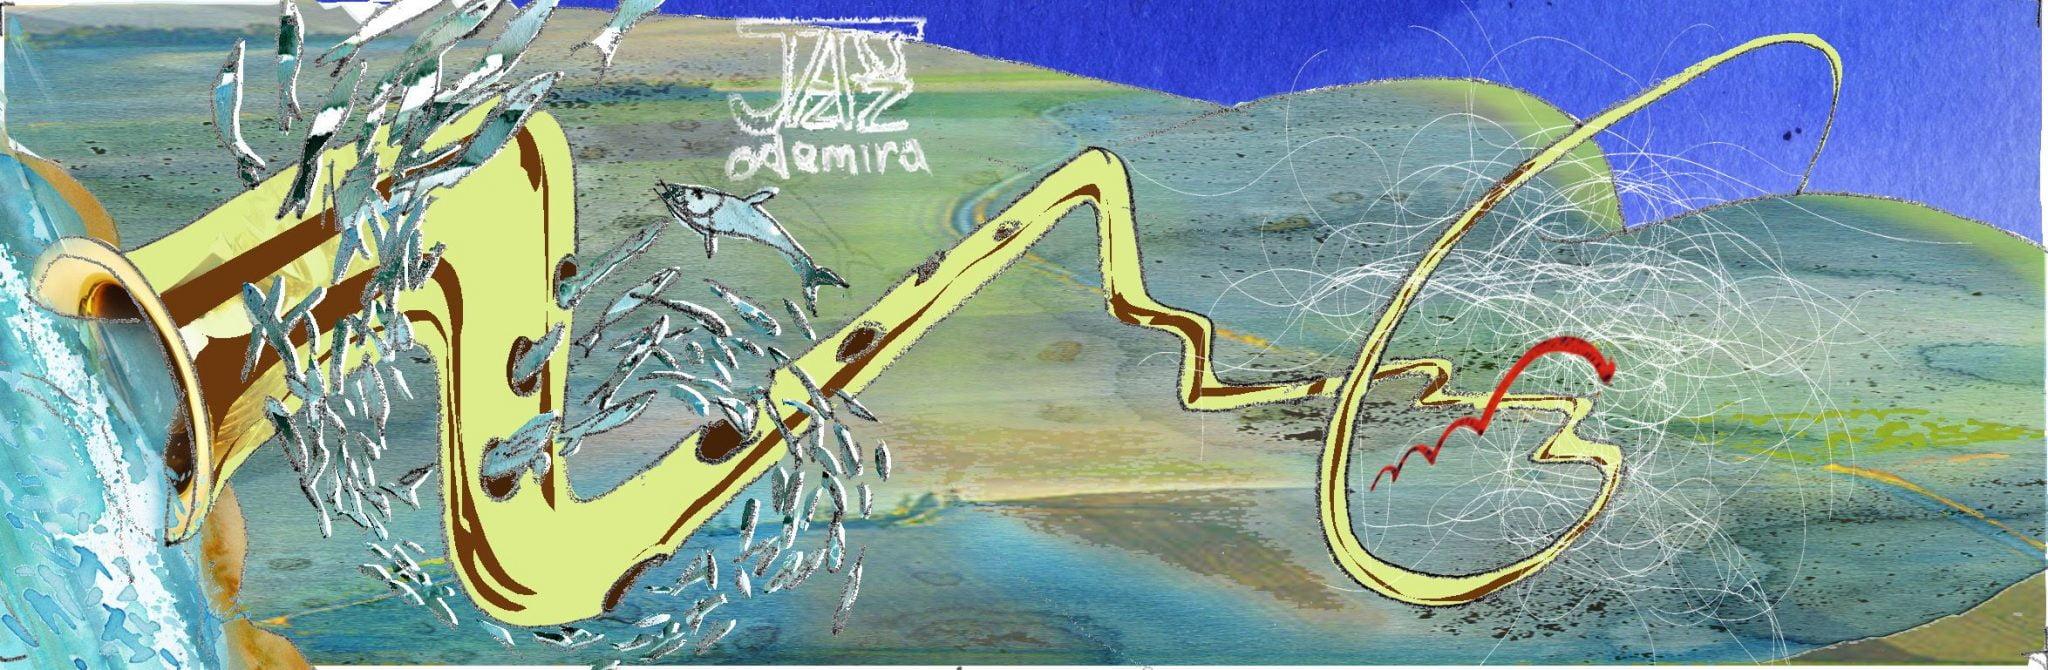 tass-jazz-rough